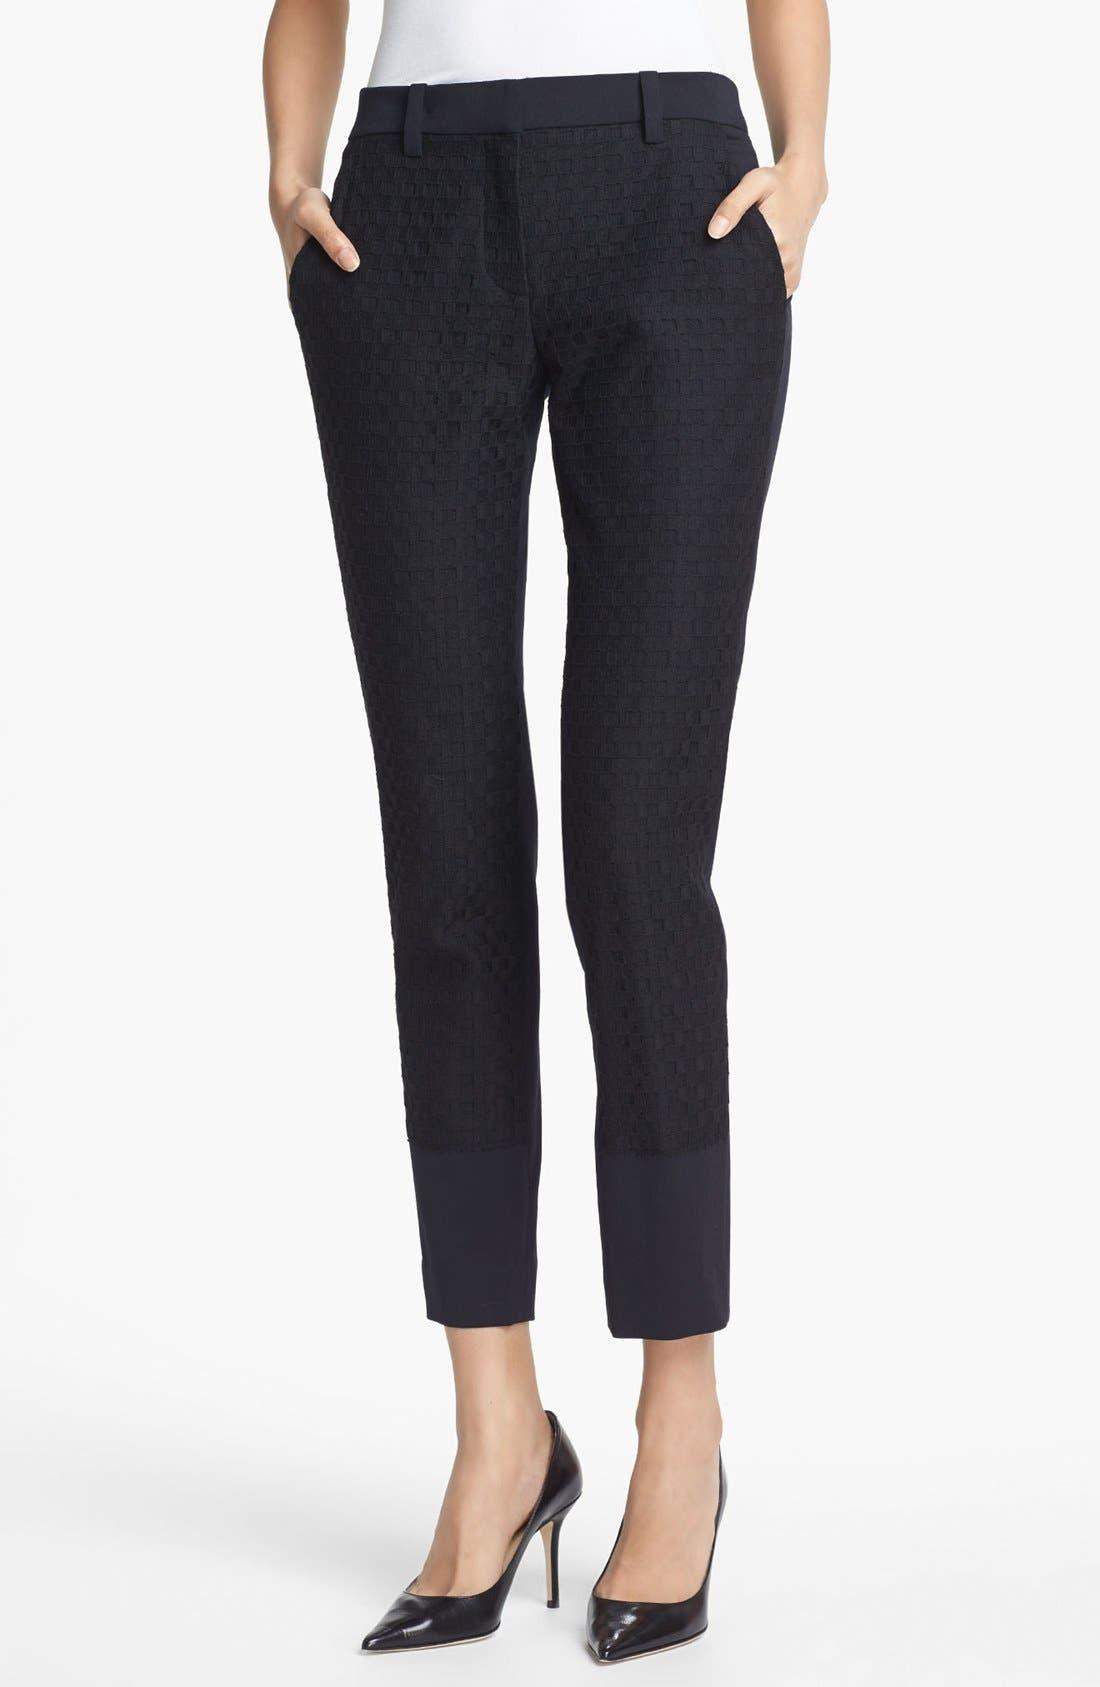 Main Image - A.L.C. 'Taylor' Checkerboard Lace Pants